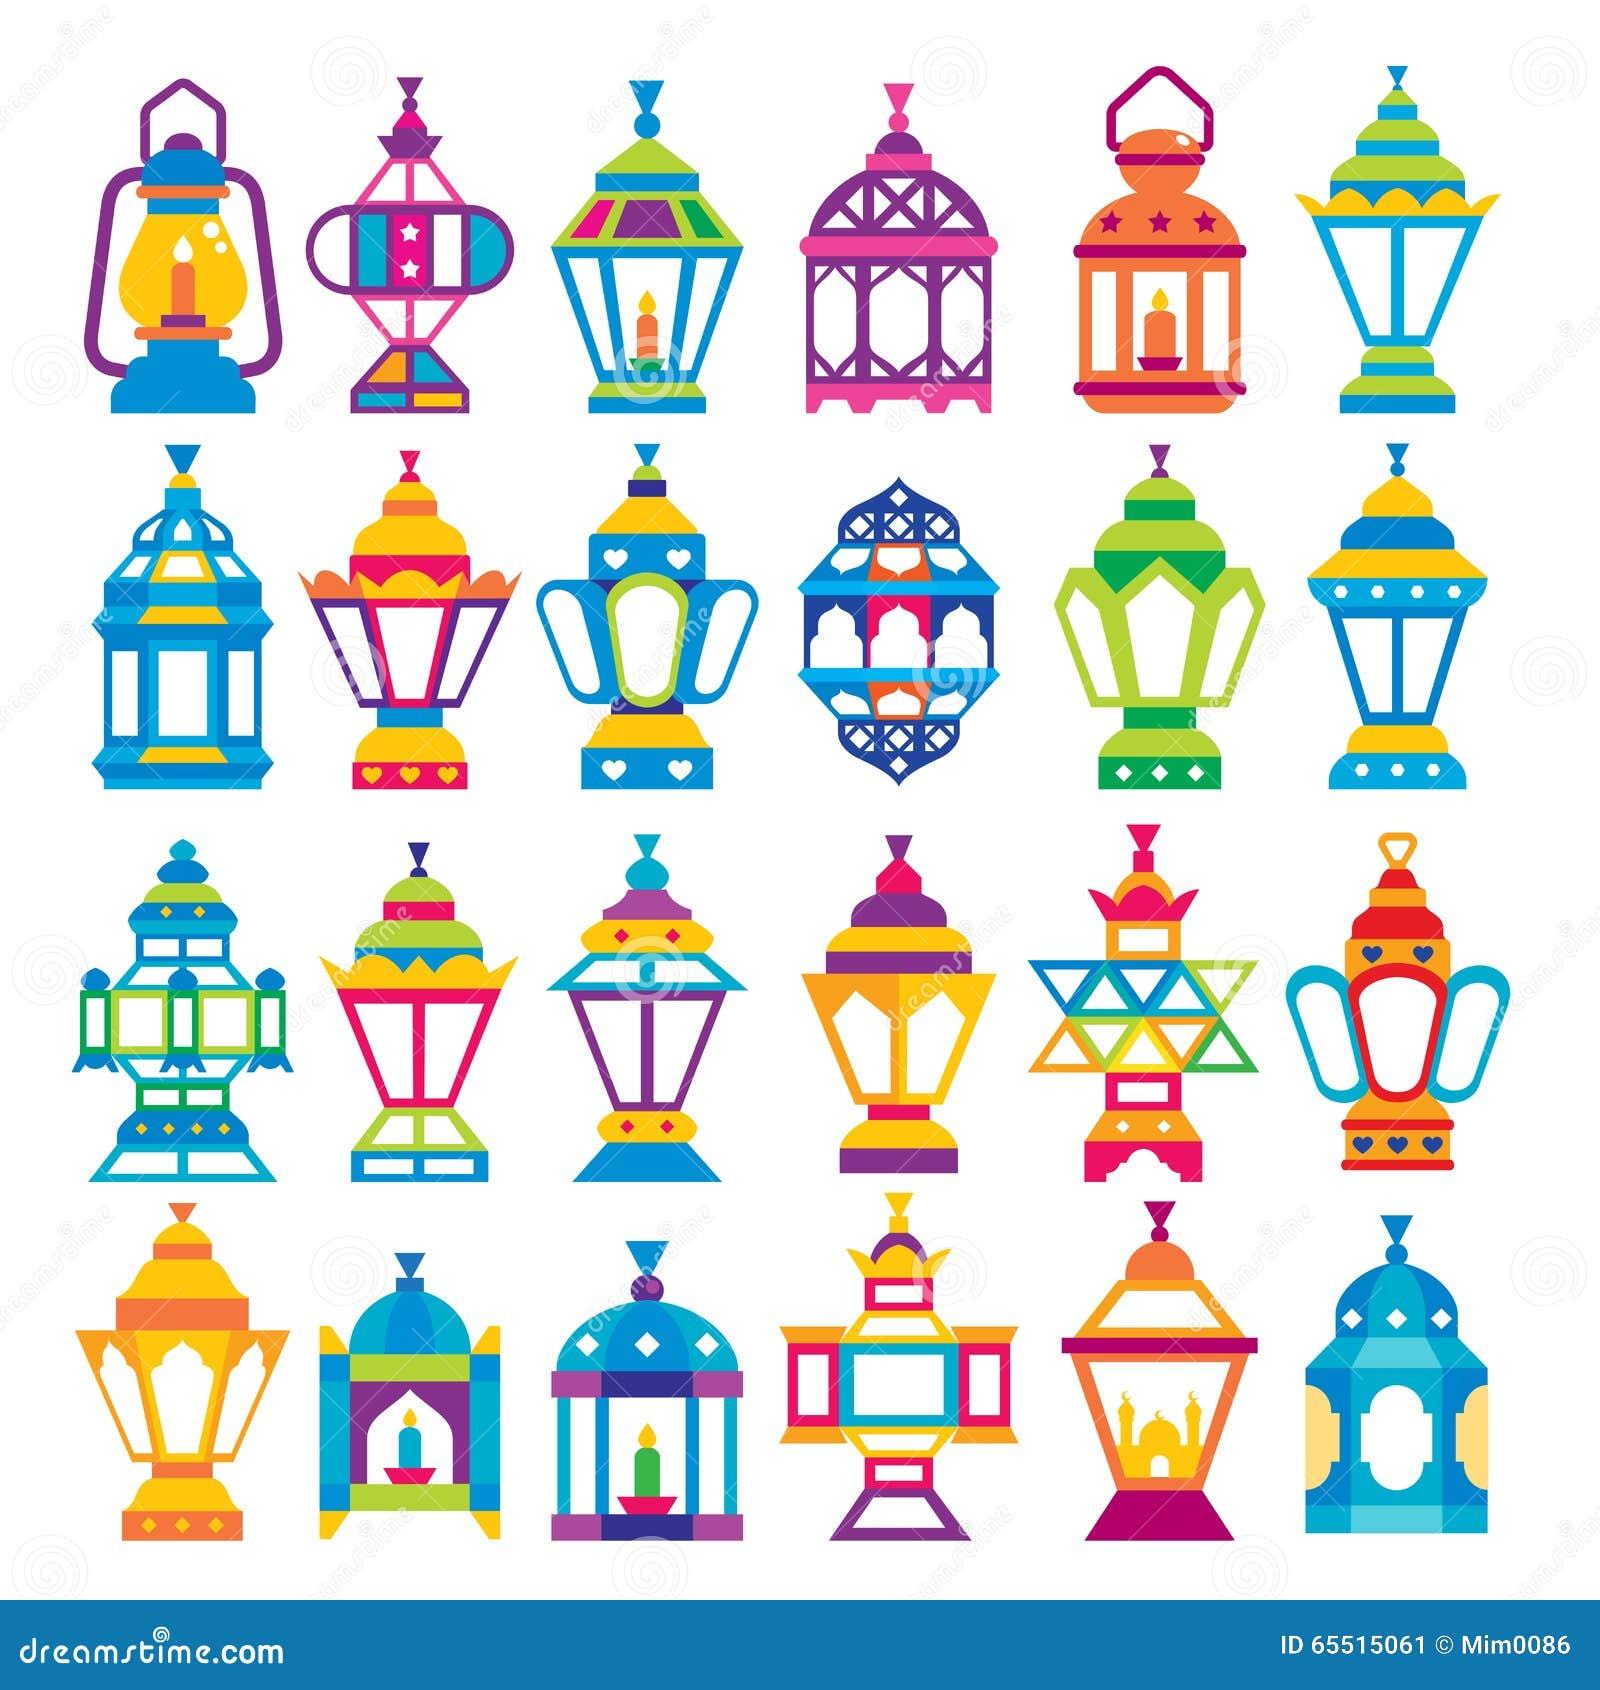 Gallery For gt Ramadan Lantern Cartoon